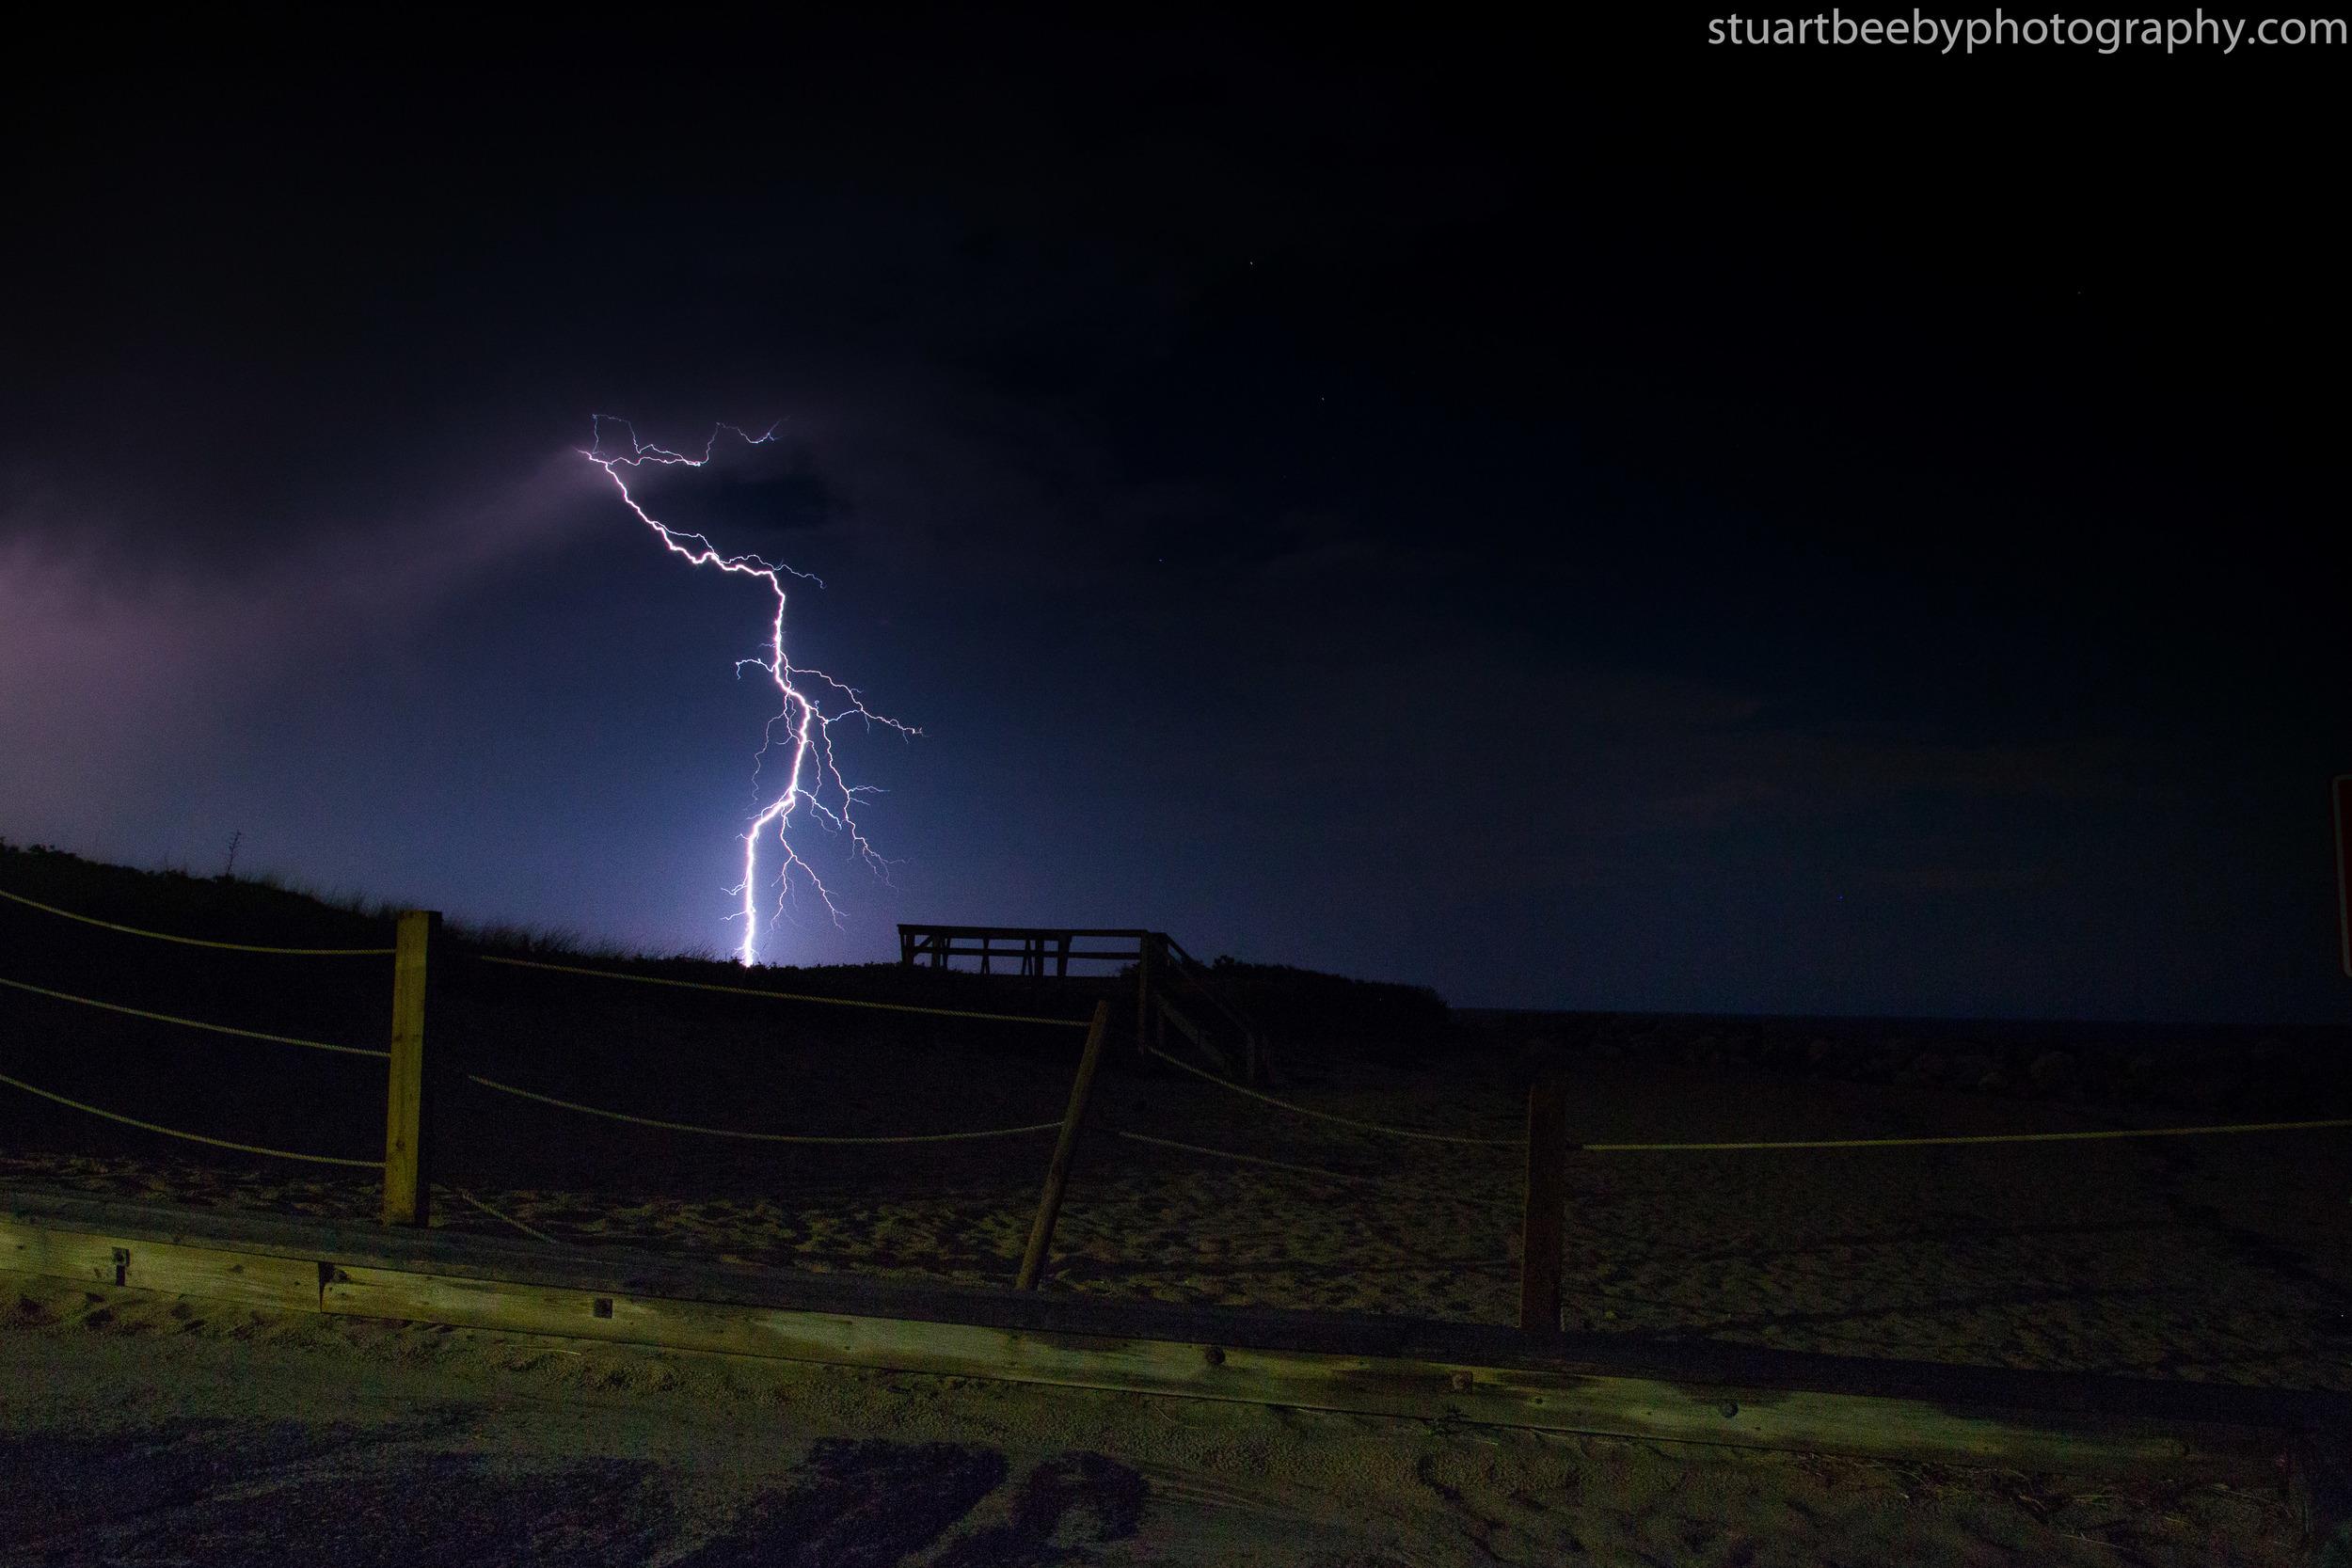 Lightening Strike at Corporation Beach, Dennis, Cape Cod